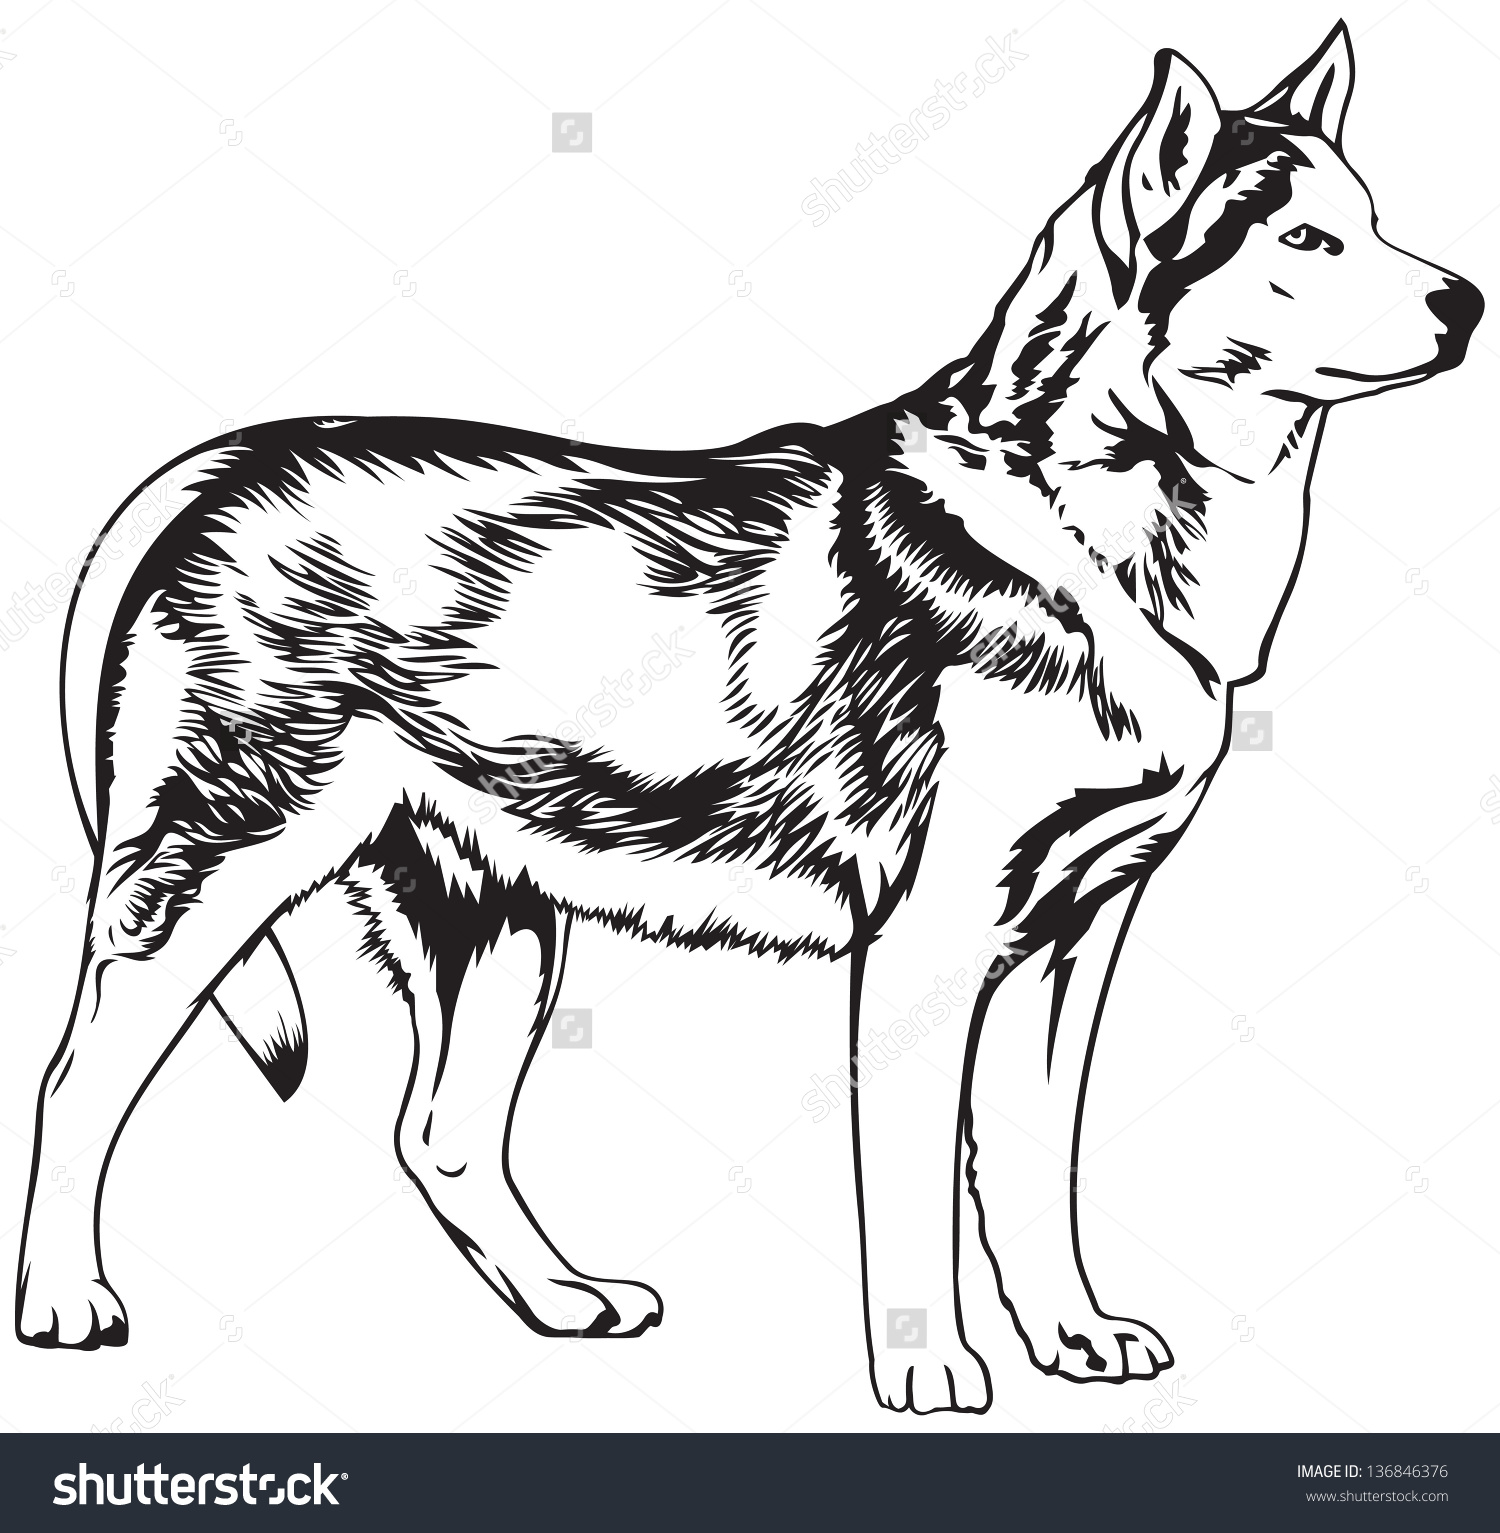 Husky Dog Breed Vector Illustration Dogs Stock Vector 136846376.